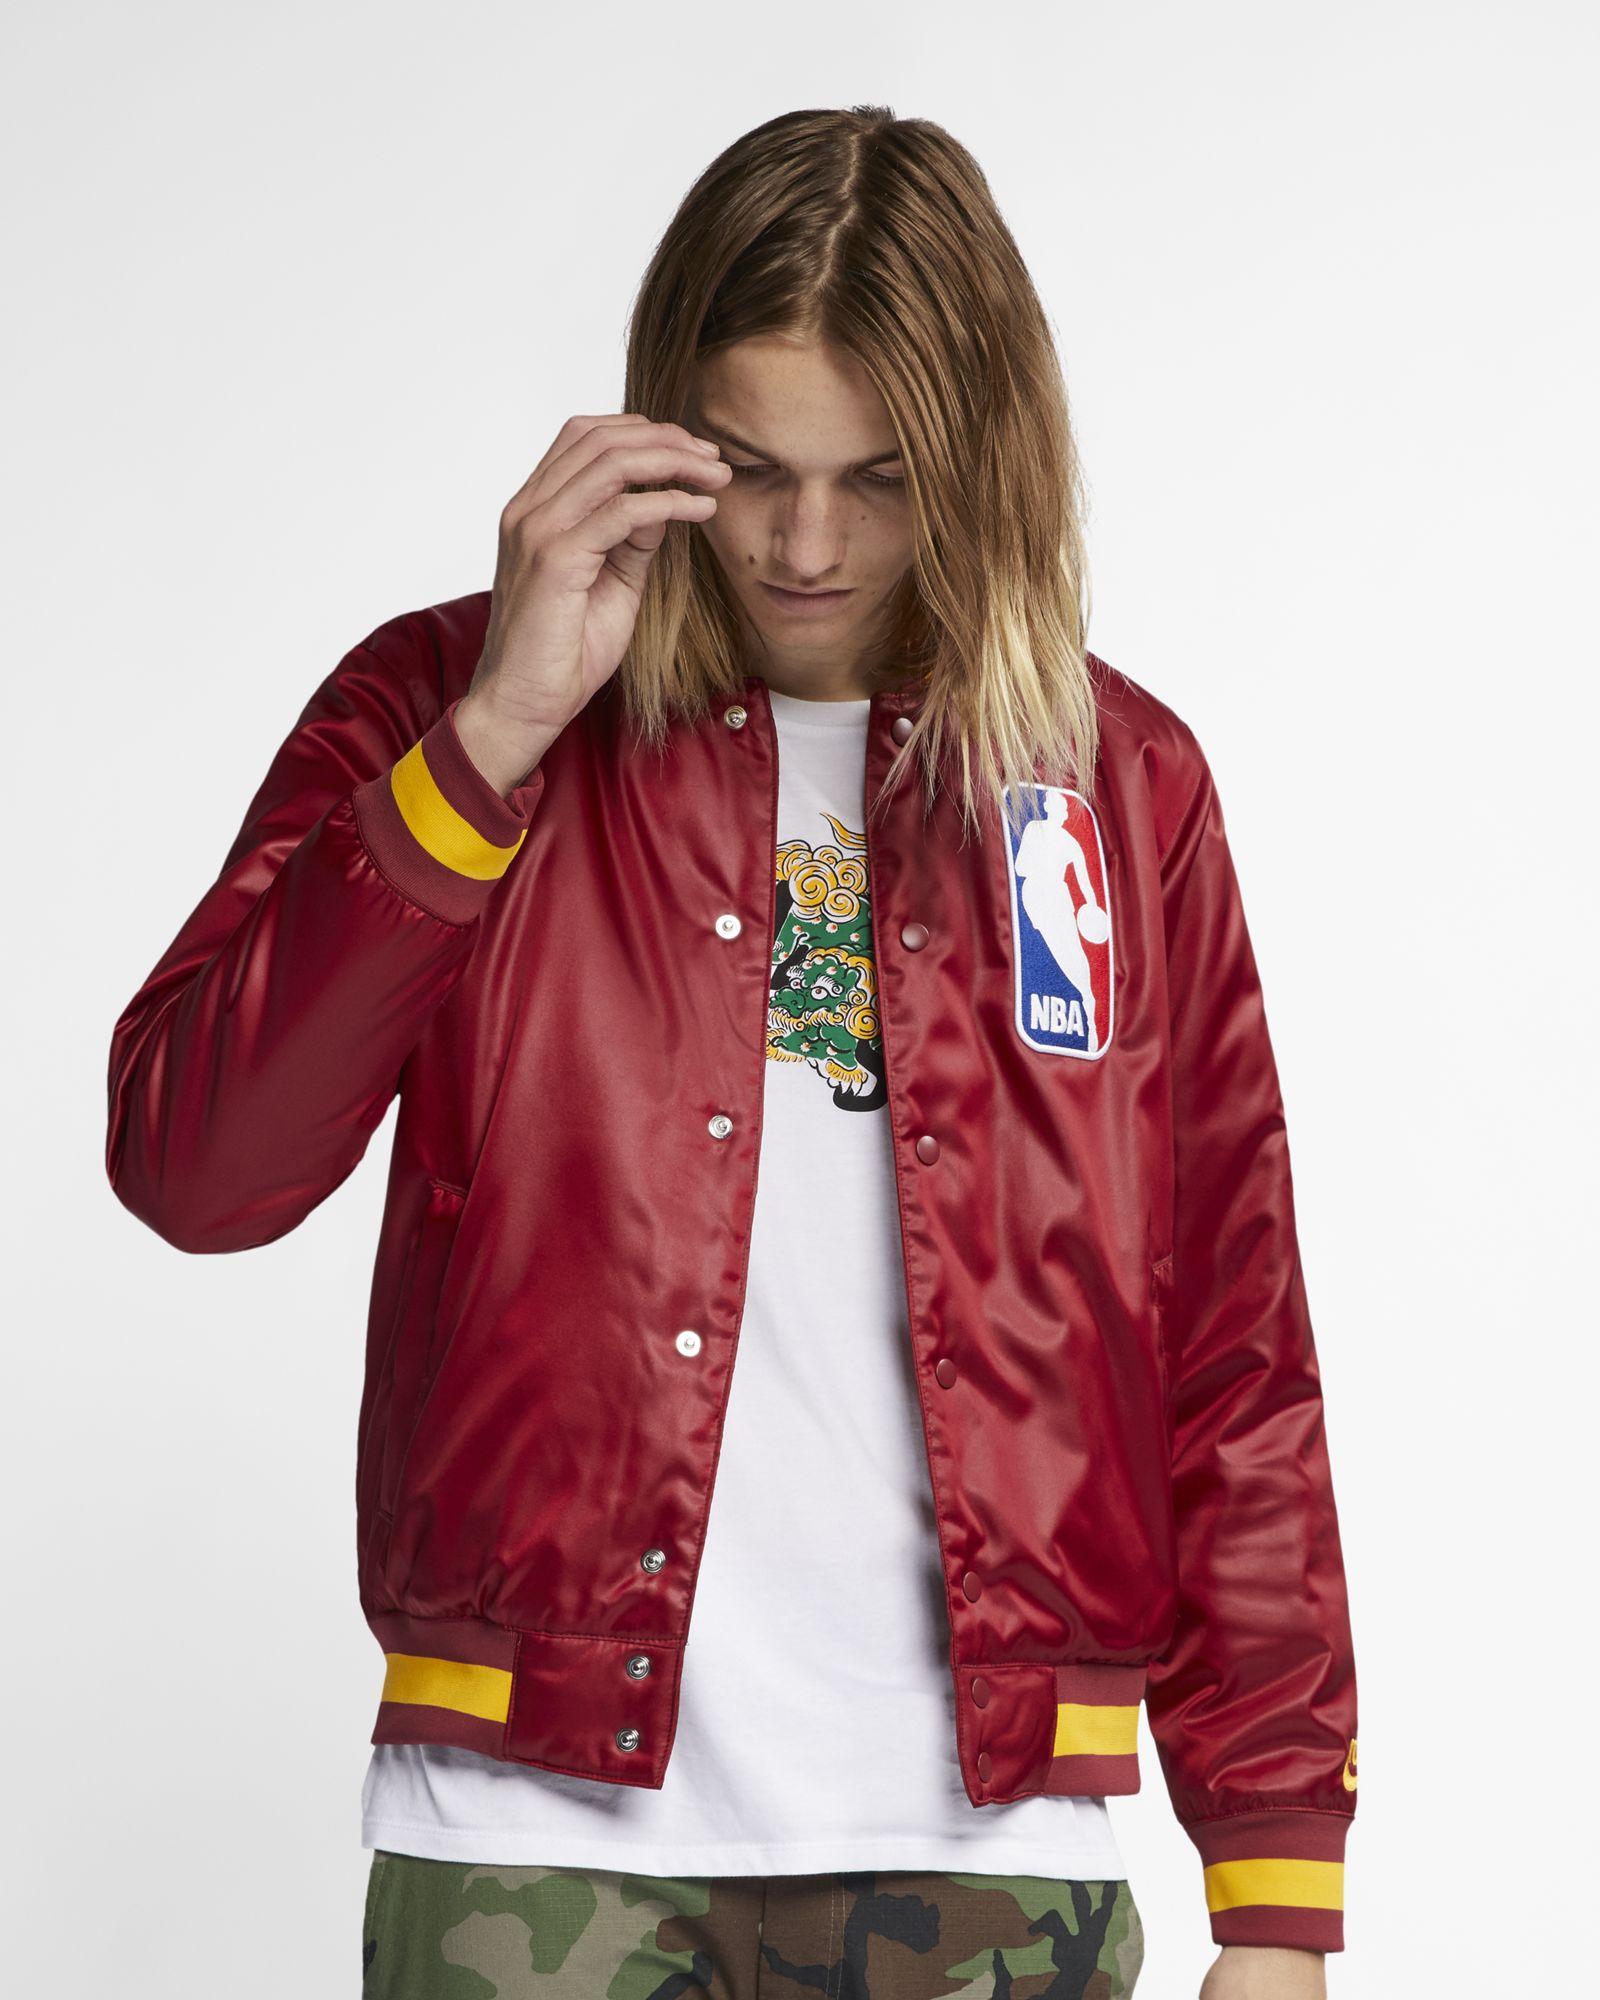 df2326097e4 Nike SB x NBA Bomber Jacket - NBA Shop Others NBA Clubs Merchandise -  Superfanas.lt